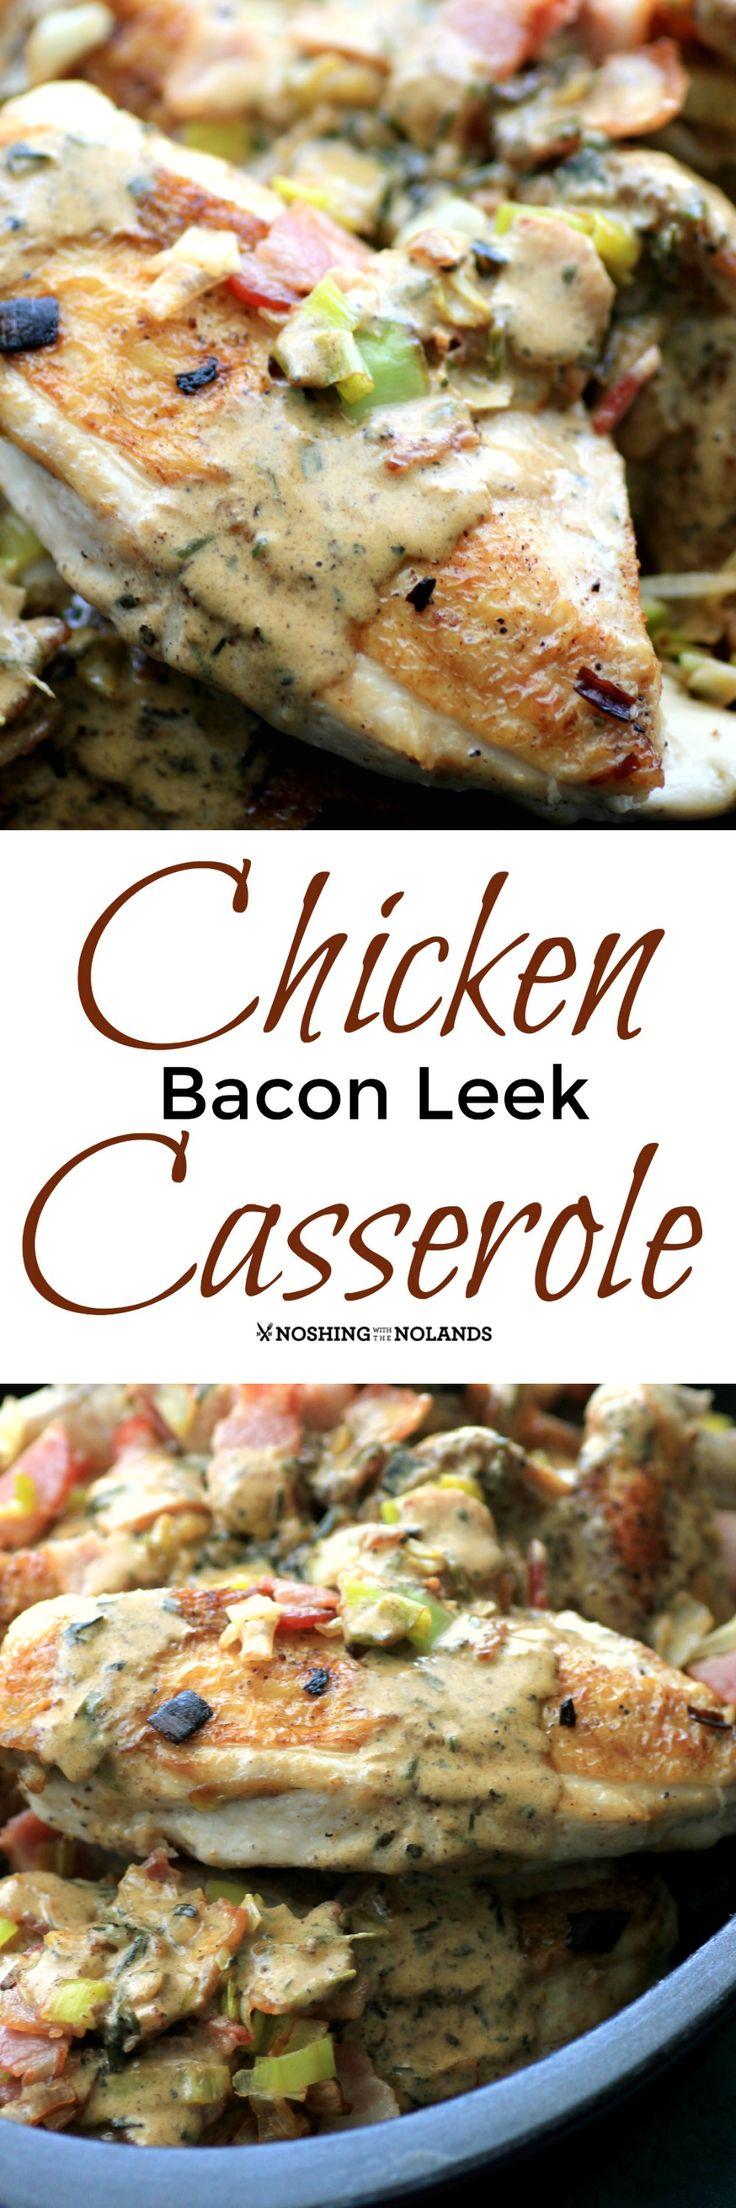 Easy chicken recipes ireland